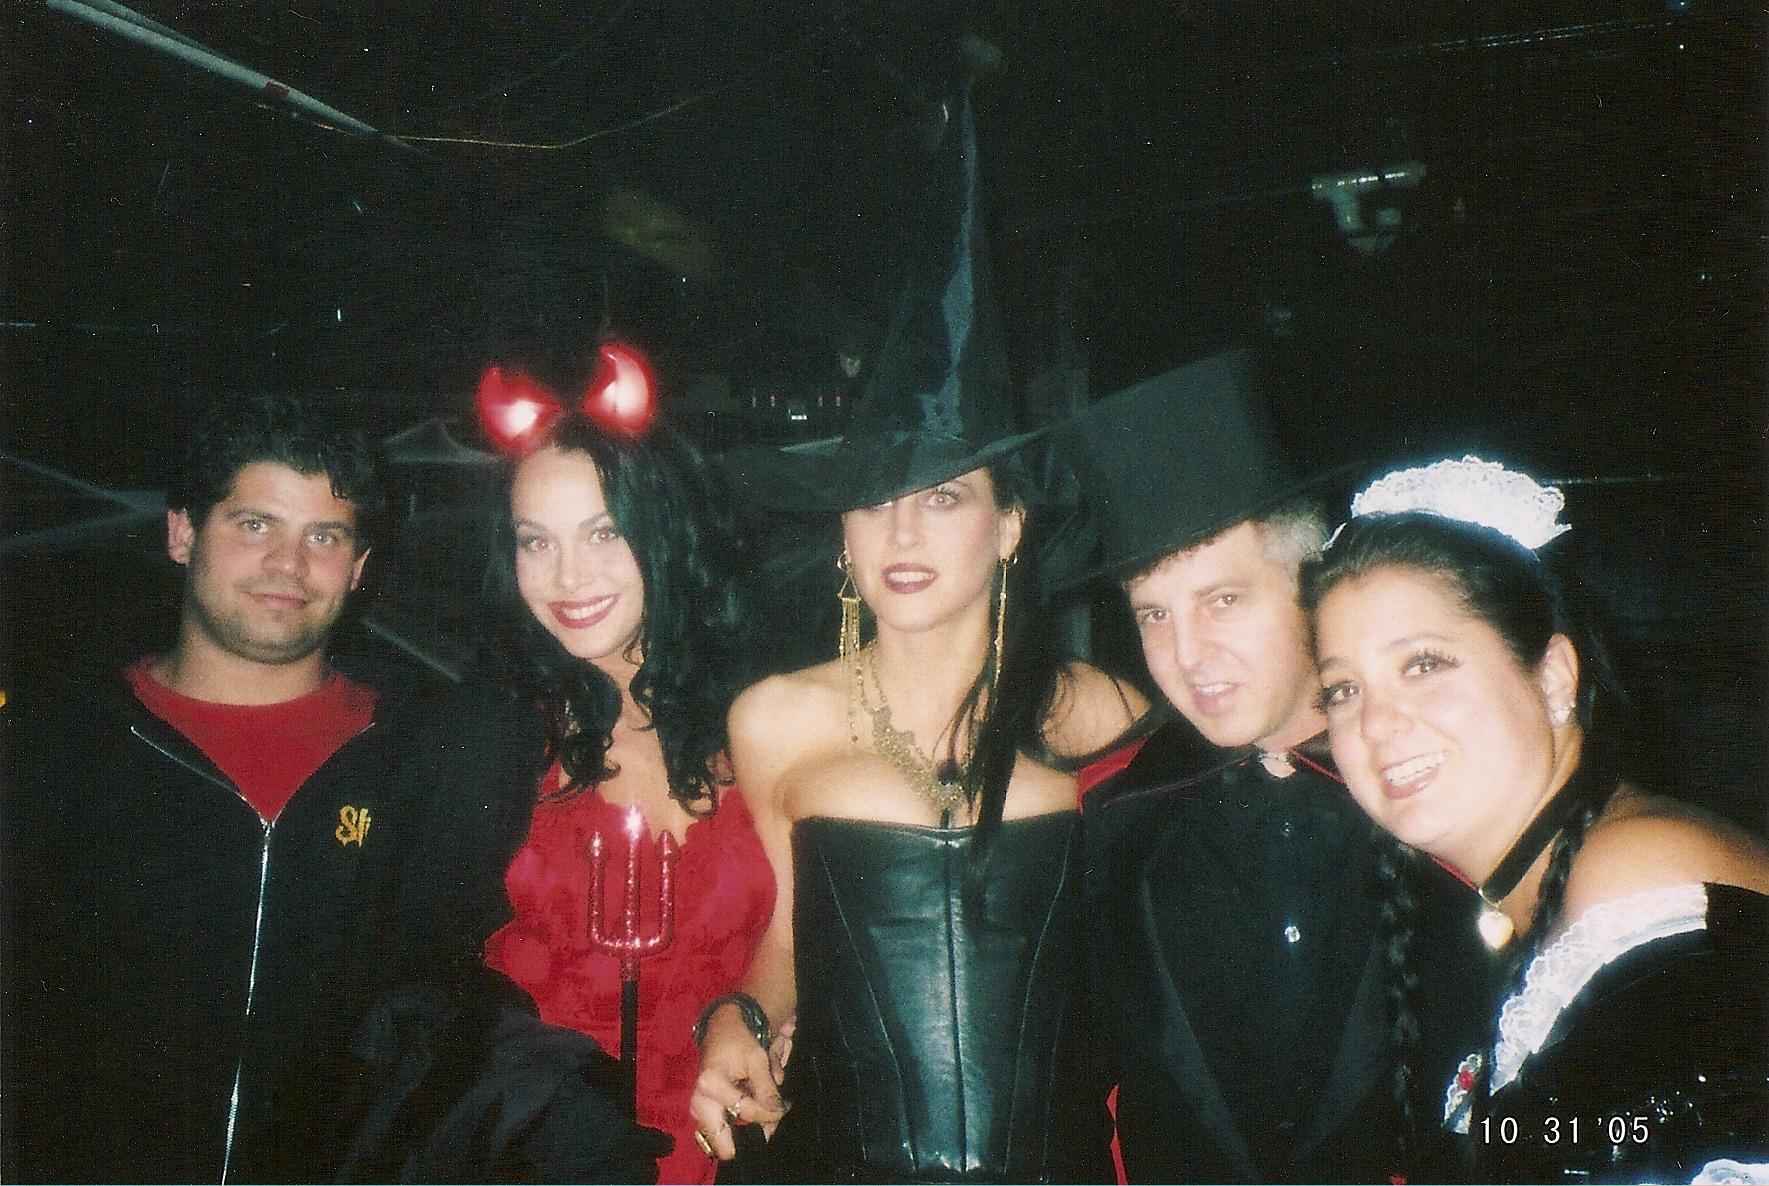 BJ Knebel, Michele Ree, Melanie Ree, Magic Marc and Romy Percansky First Avenue / Minneapolis, Minnesota / October 31, 2005